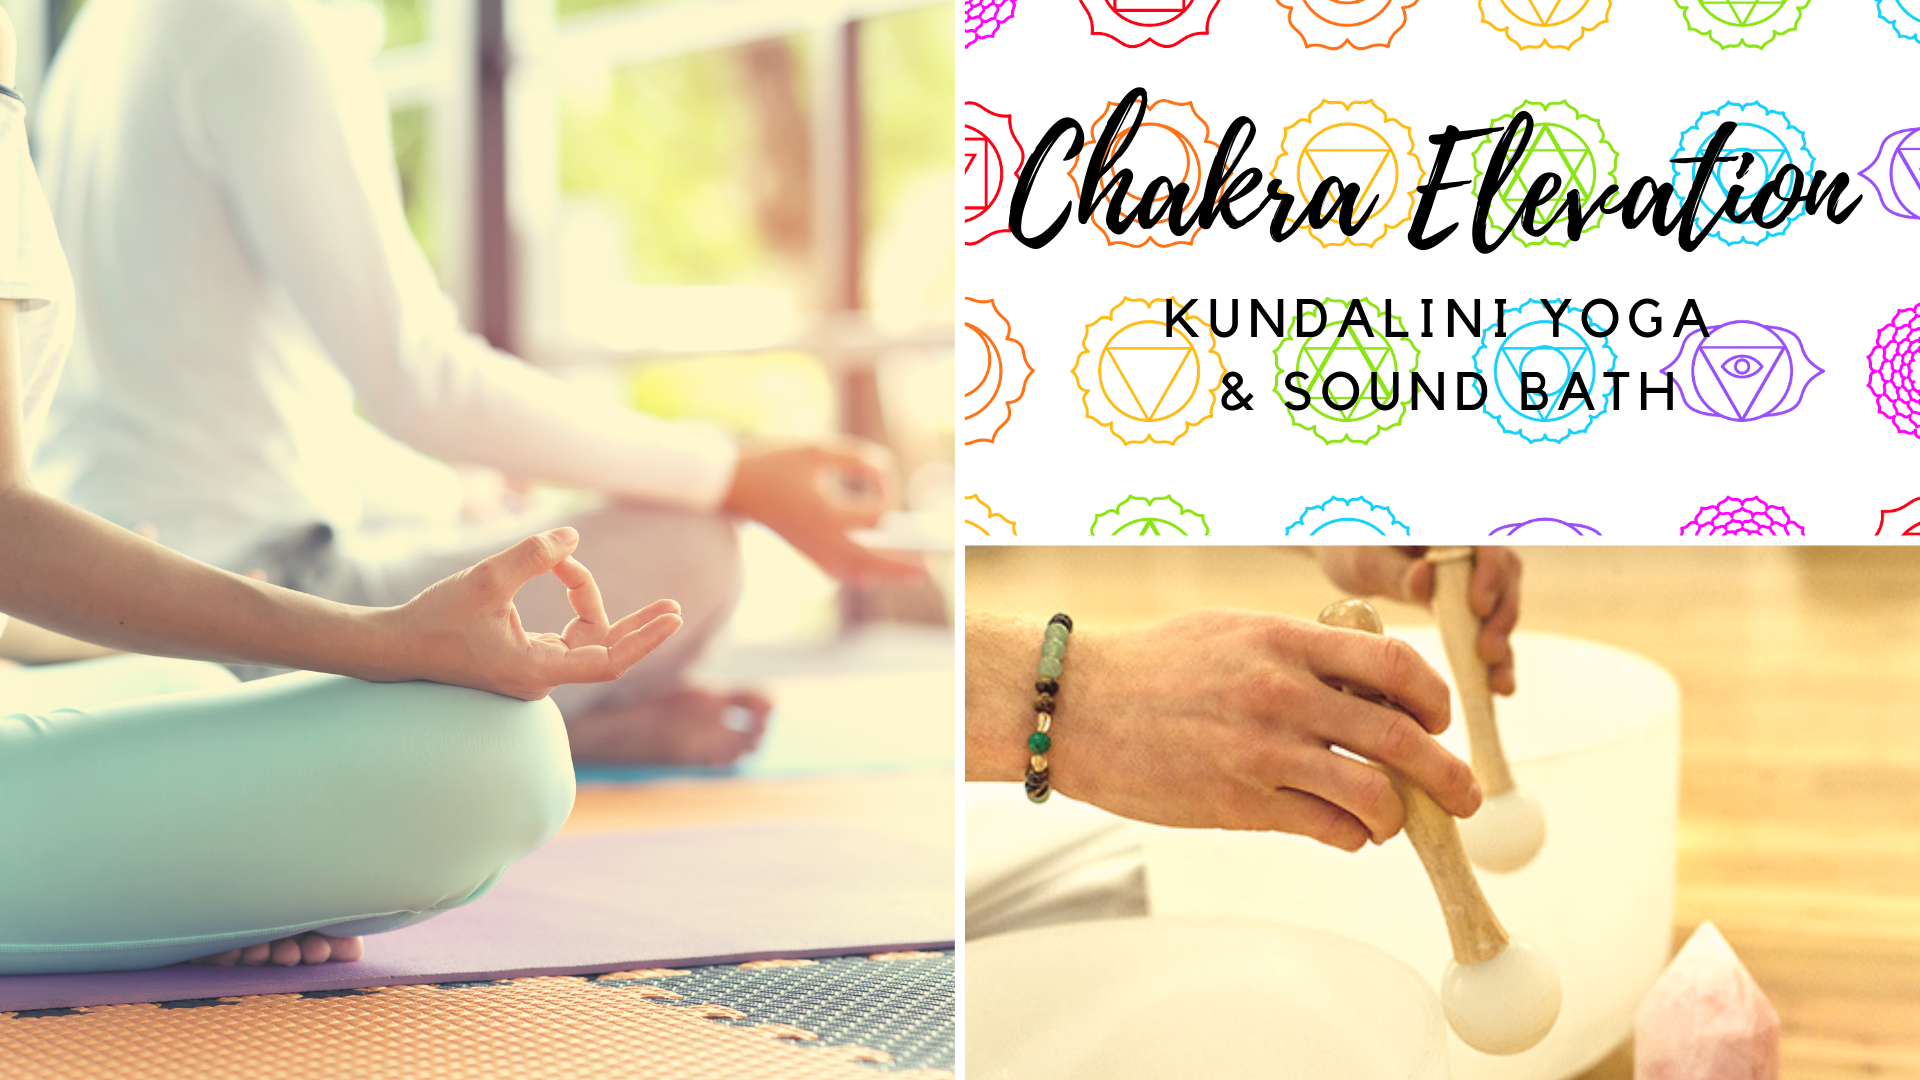 Kundalini Yoga - Chakra Balance - Estero Florida - Meditation - Fusion Yoga.jpg